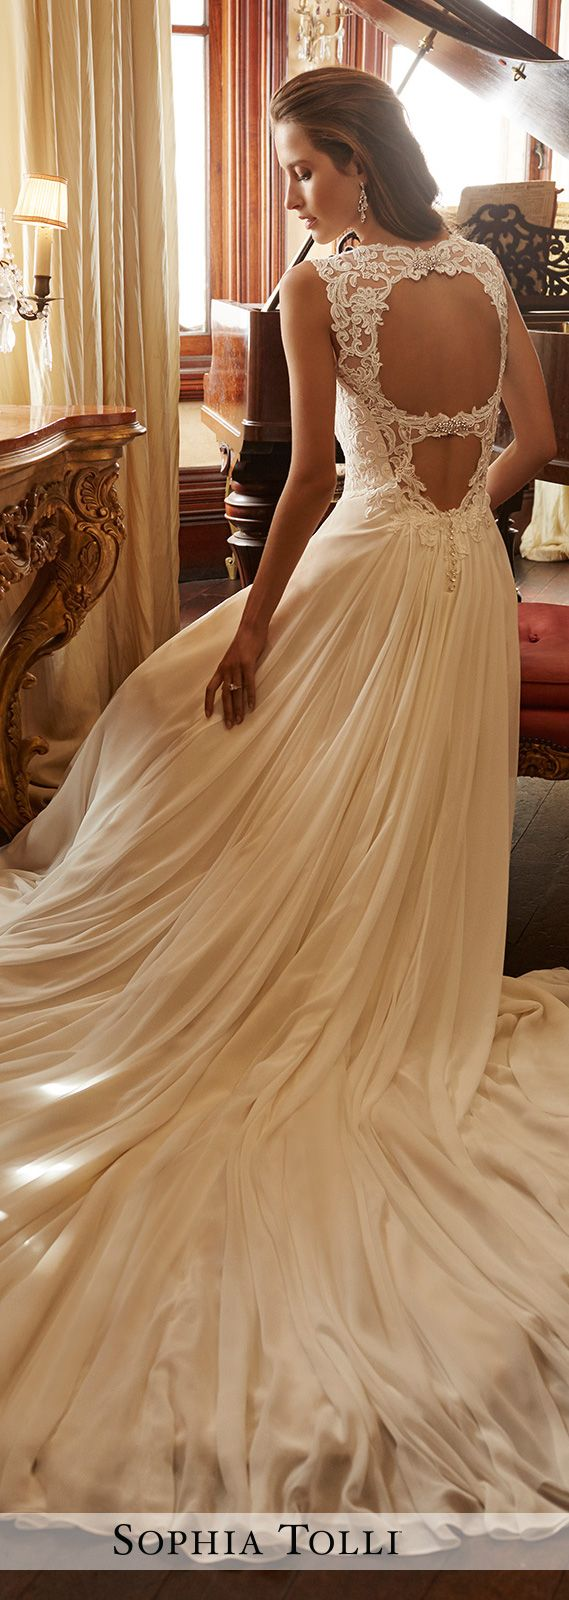 Wedding Dress by Sophia Tolli 2017